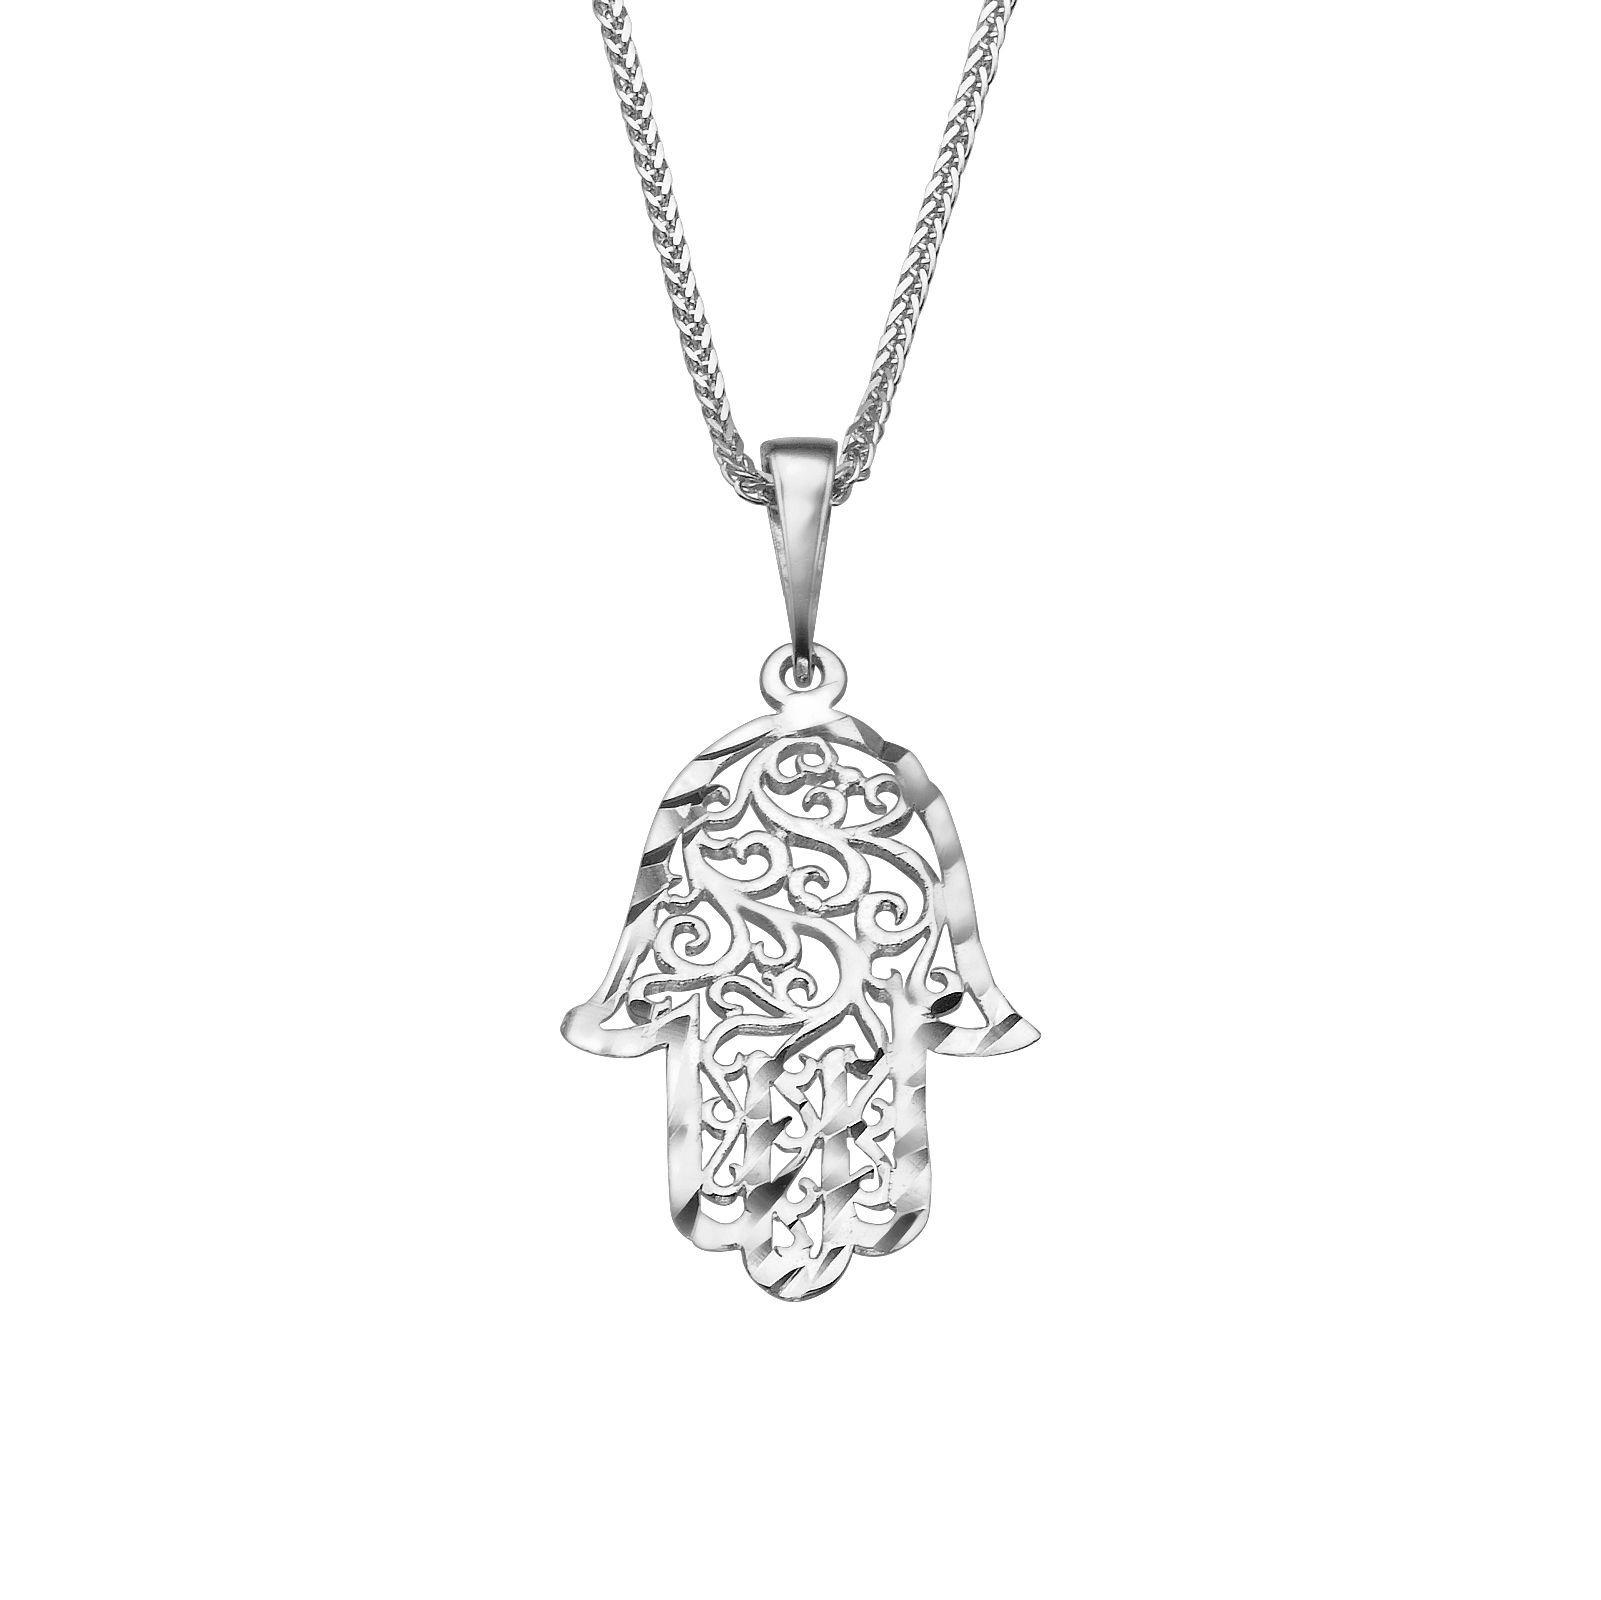 Filigree hamsa hand pendant for womenteengirls 14k white gold no sm img aloadofball Images